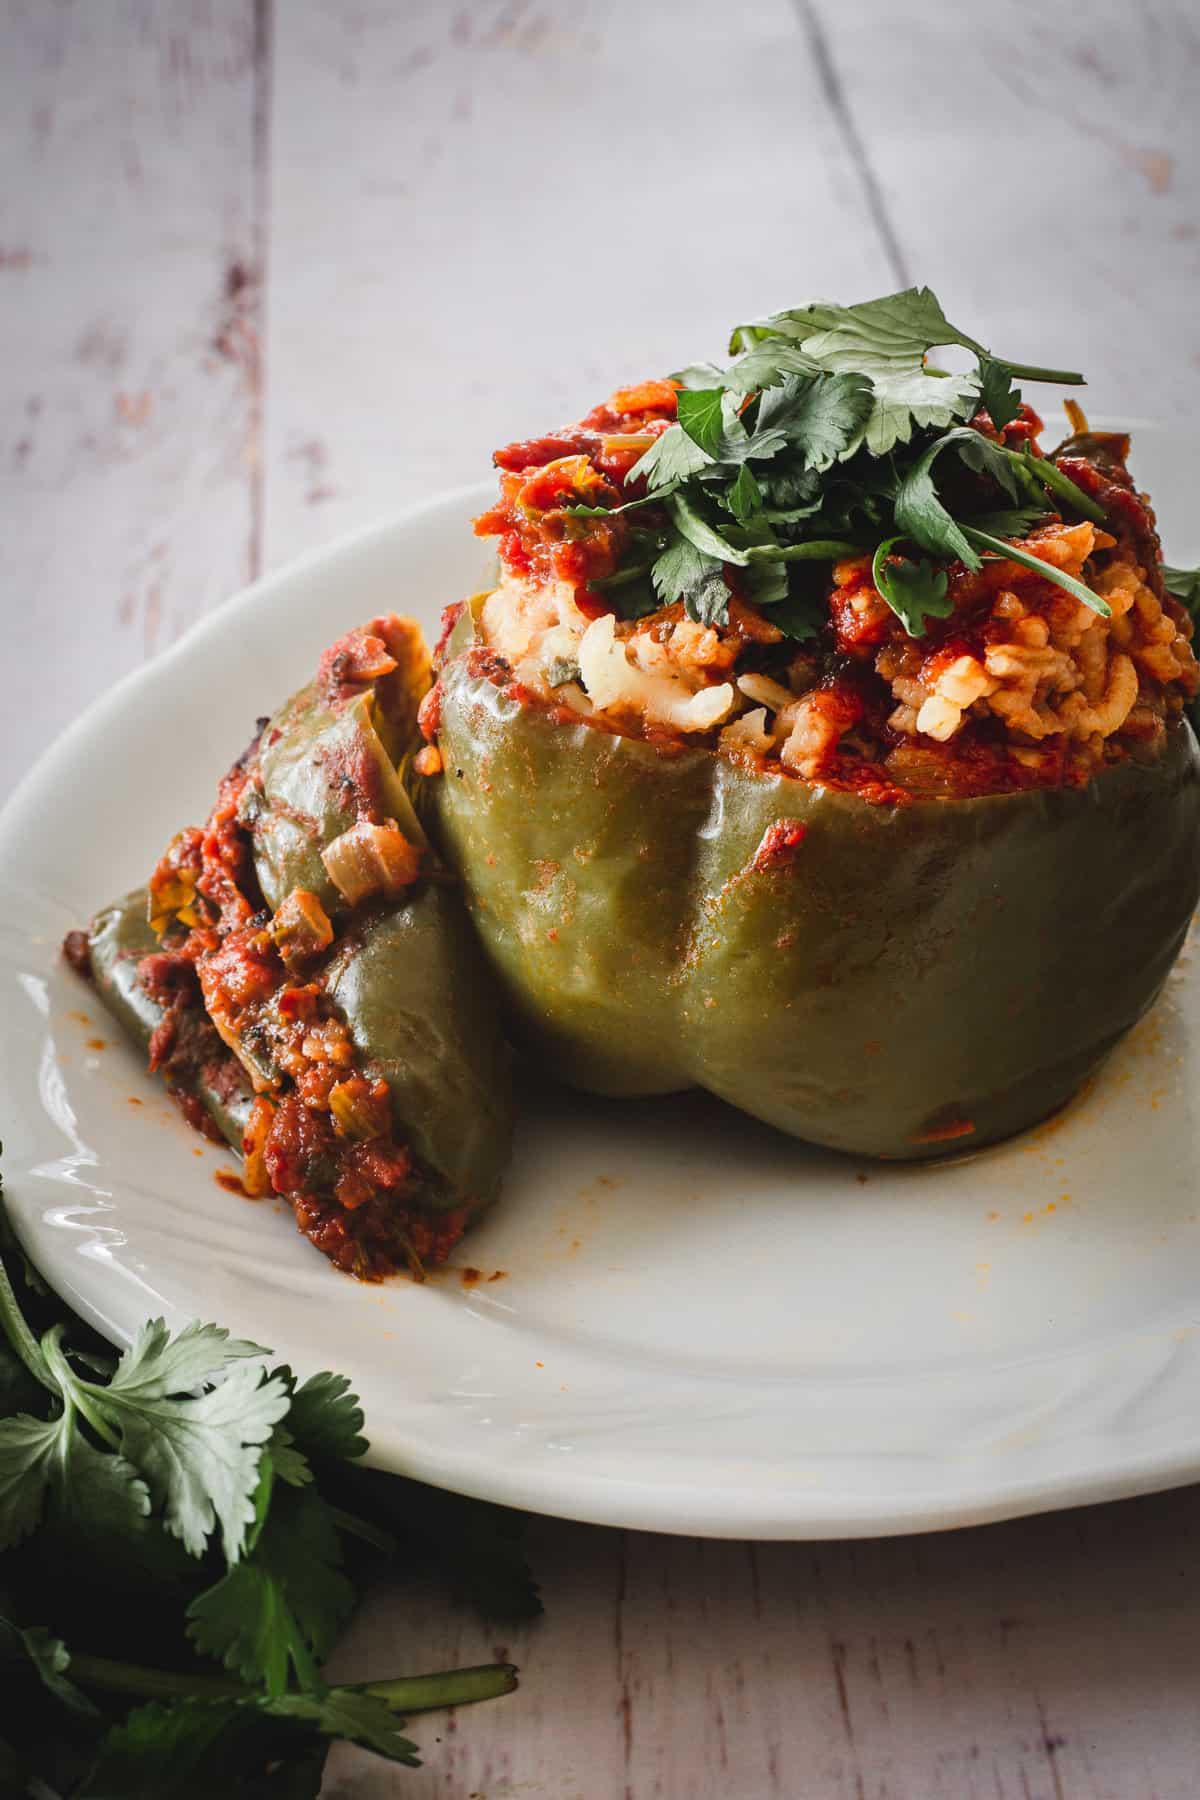 ground turkey stuffed green pepper on a plate